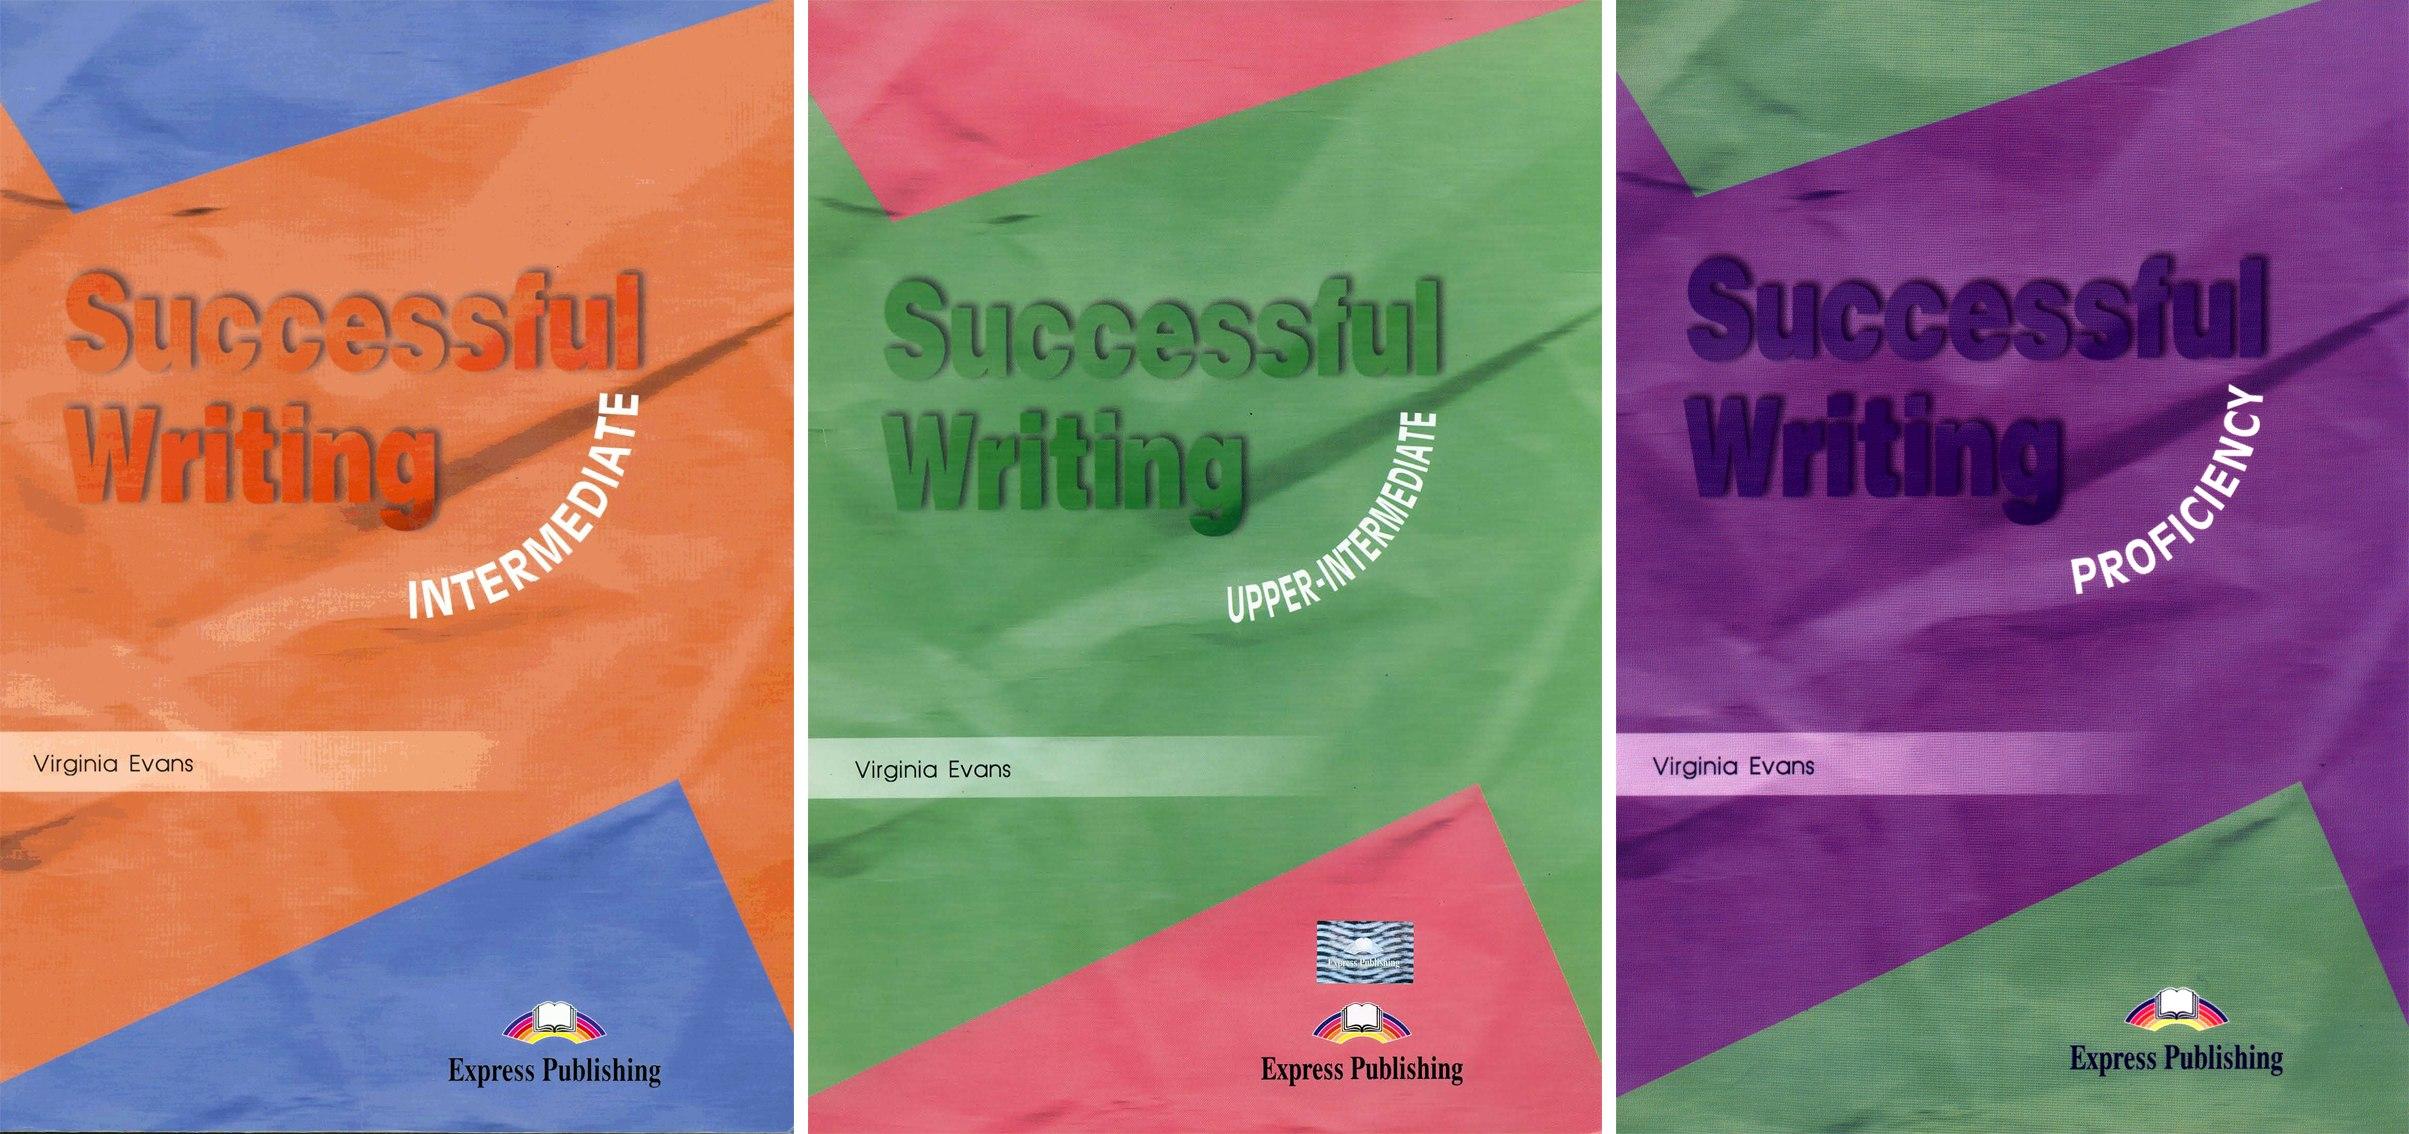 Successful Writing Pdf